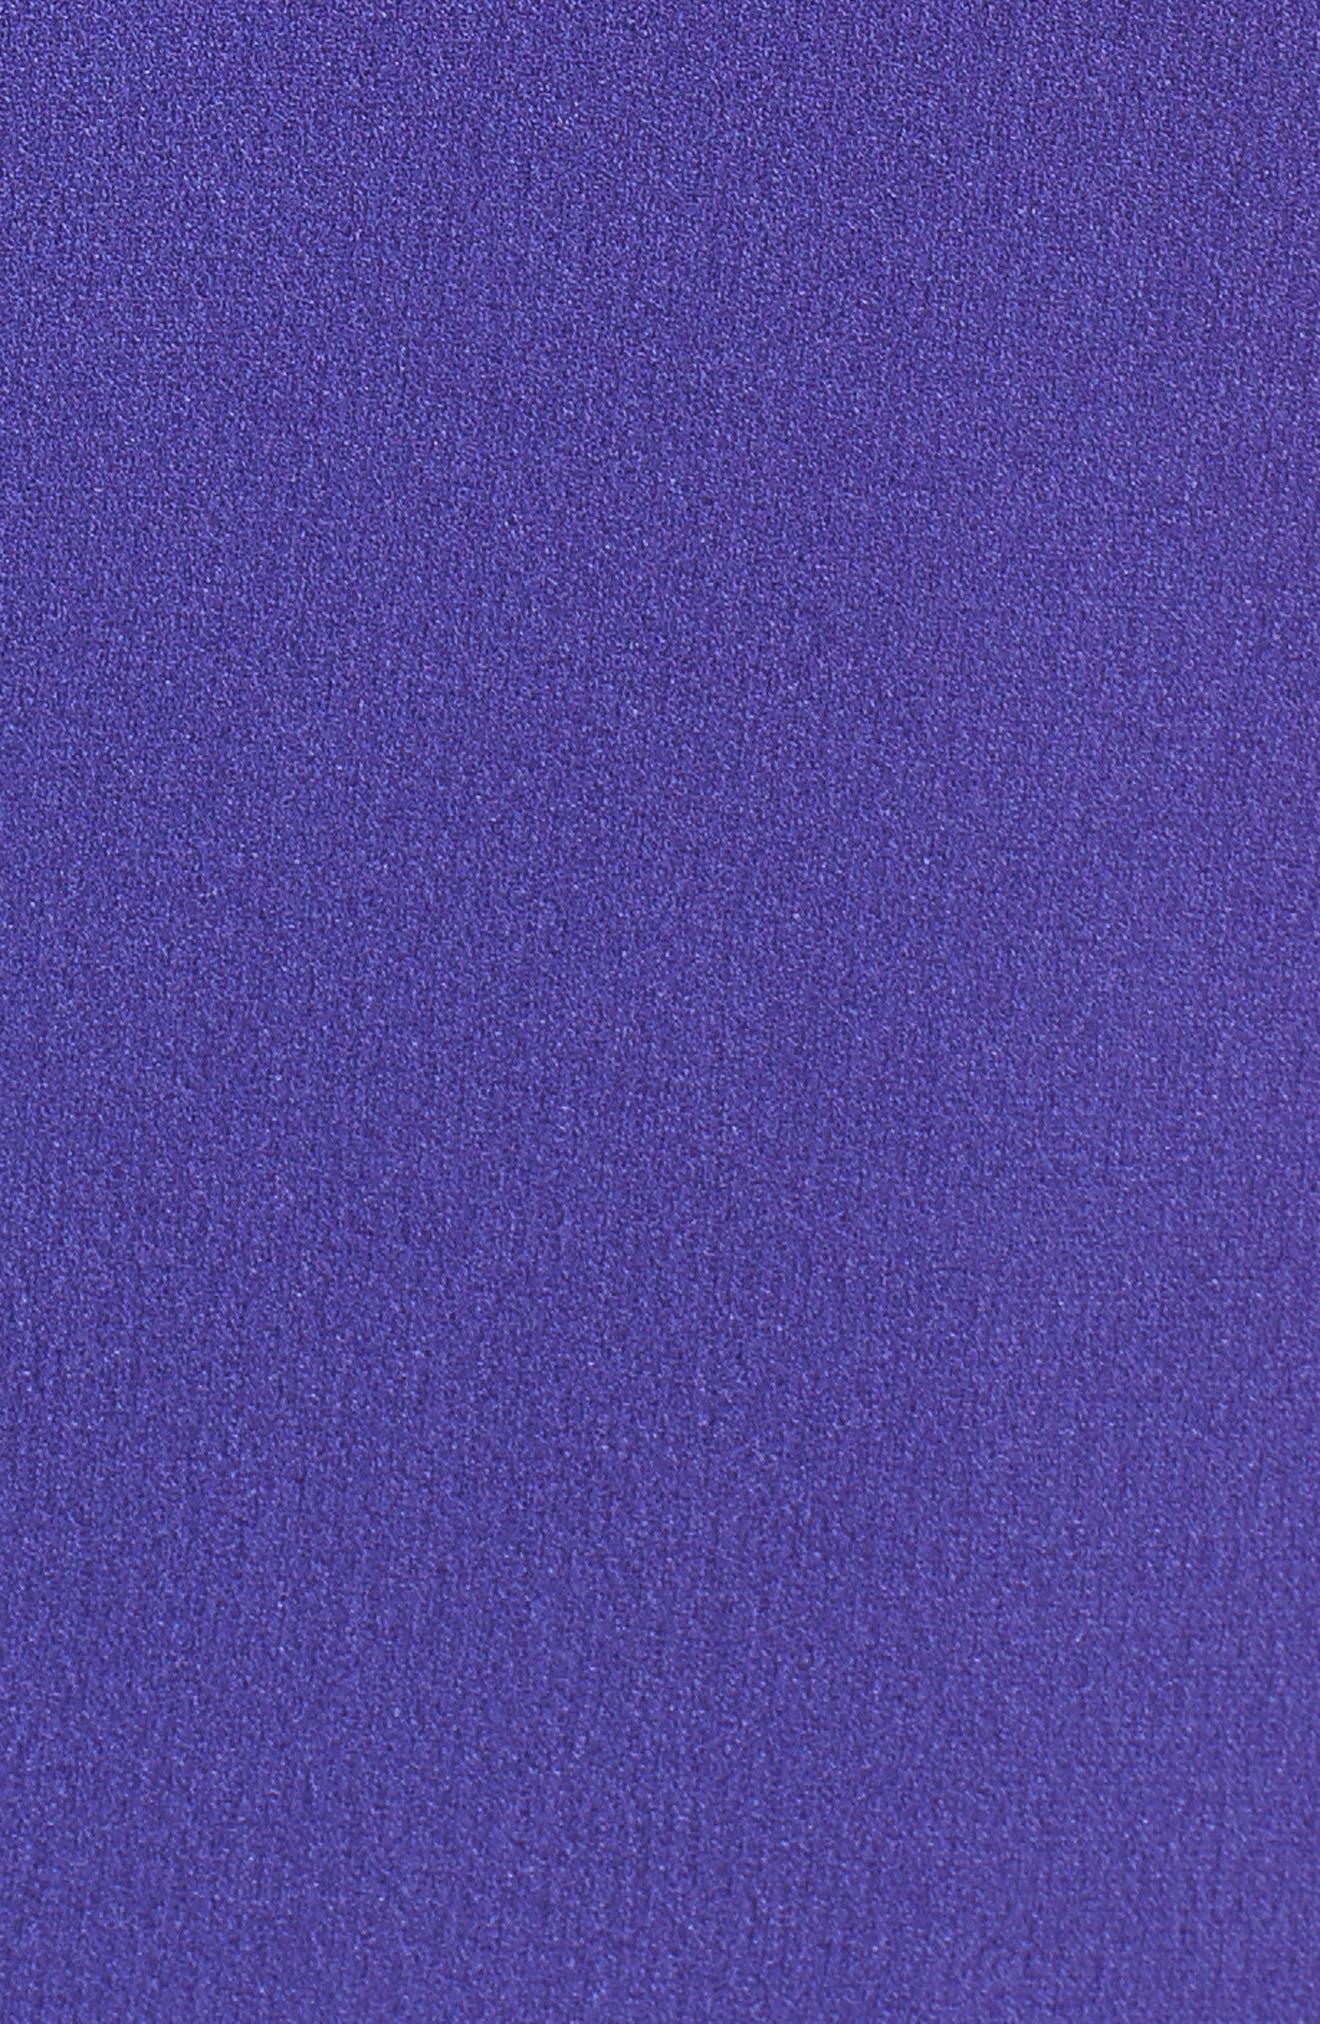 Hailey Crepe Dress,                             Alternate thumbnail 125, color,